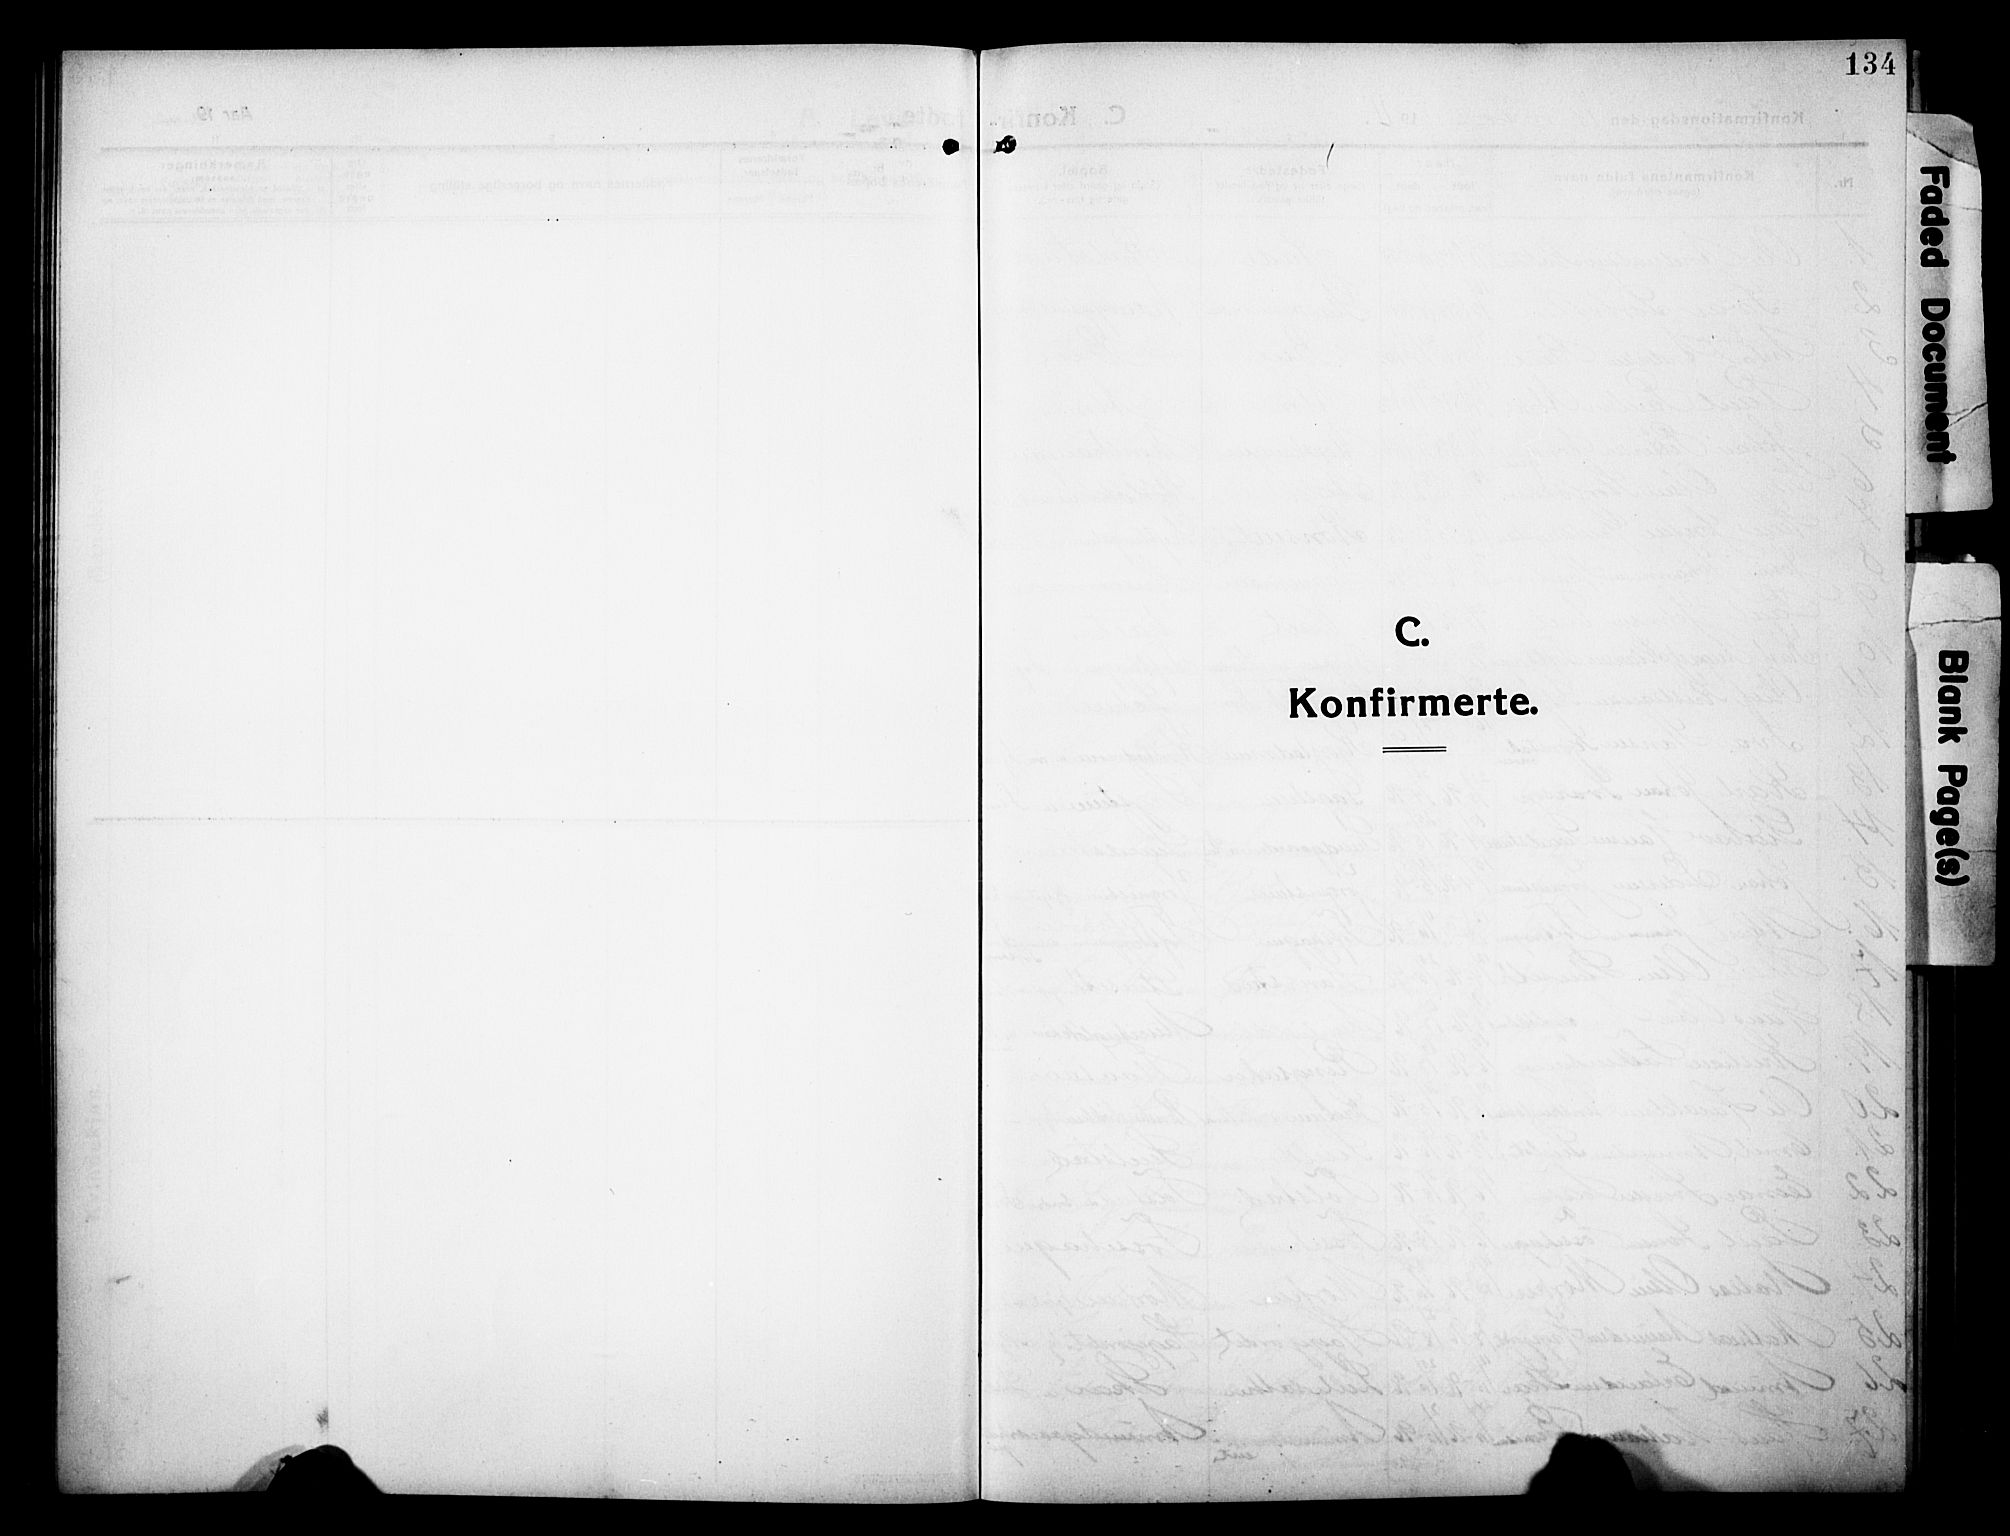 SAH, Sør-Fron prestekontor, H/Ha/Hab/L0005: Klokkerbok nr. 5, 1912-1930, s. 134